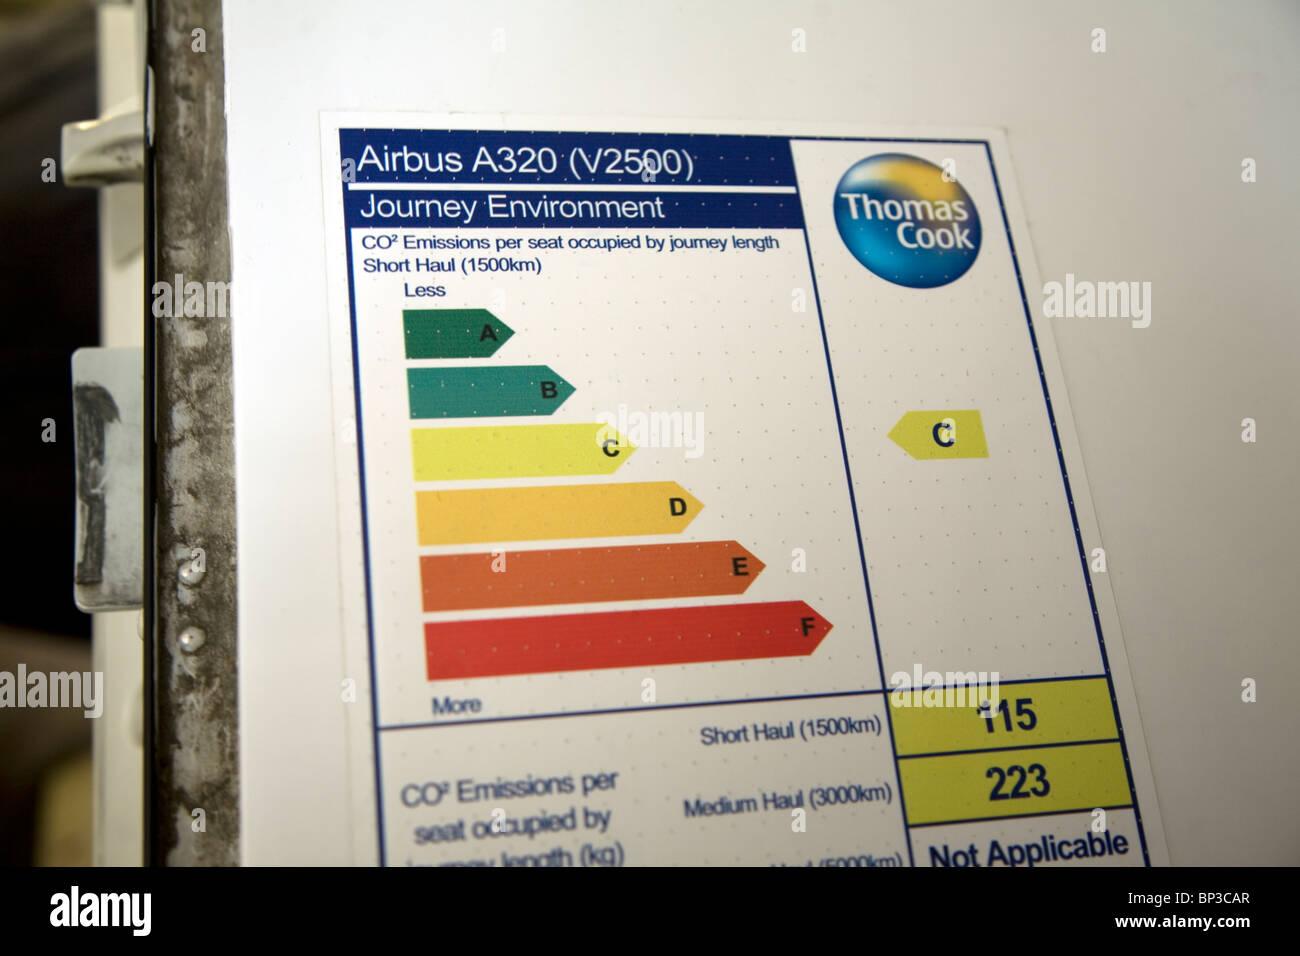 Plane Carbon dioxide emissions diagram Airbus A320 - Stock Image